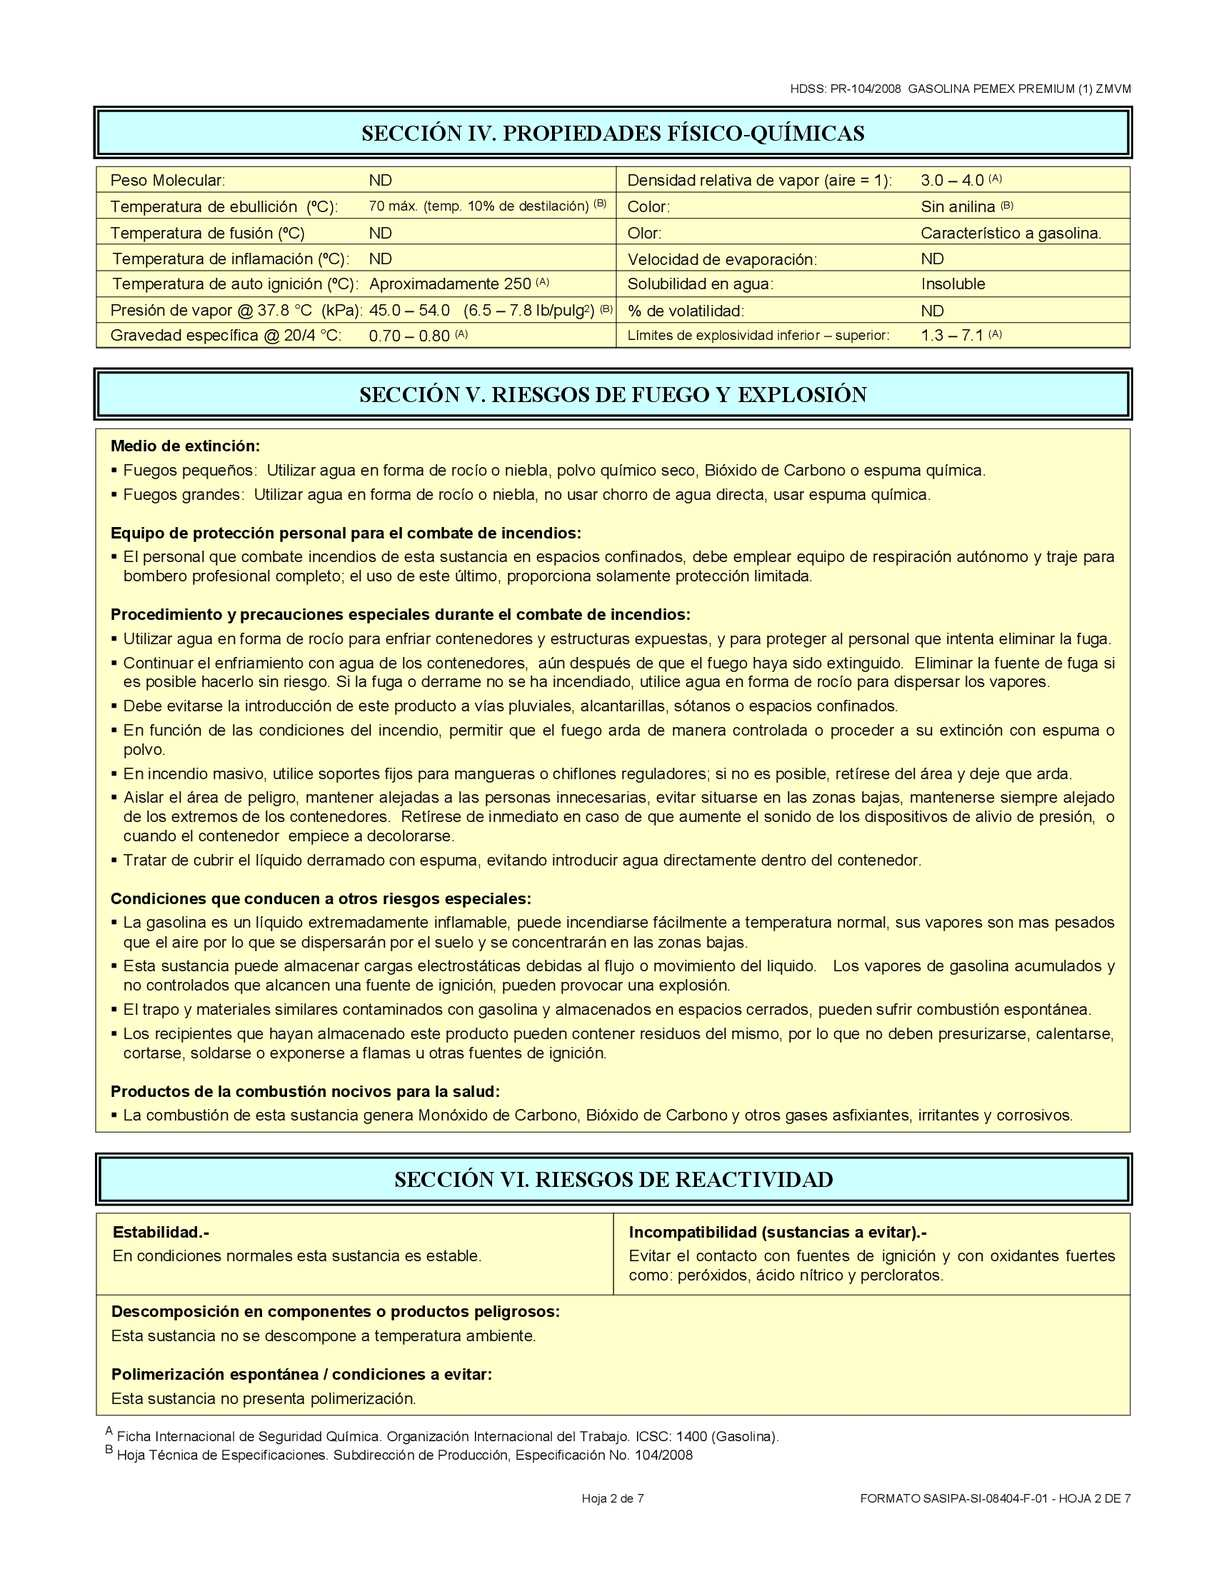 HOJA MSDS GASOLINA - CALAMEO Downloader